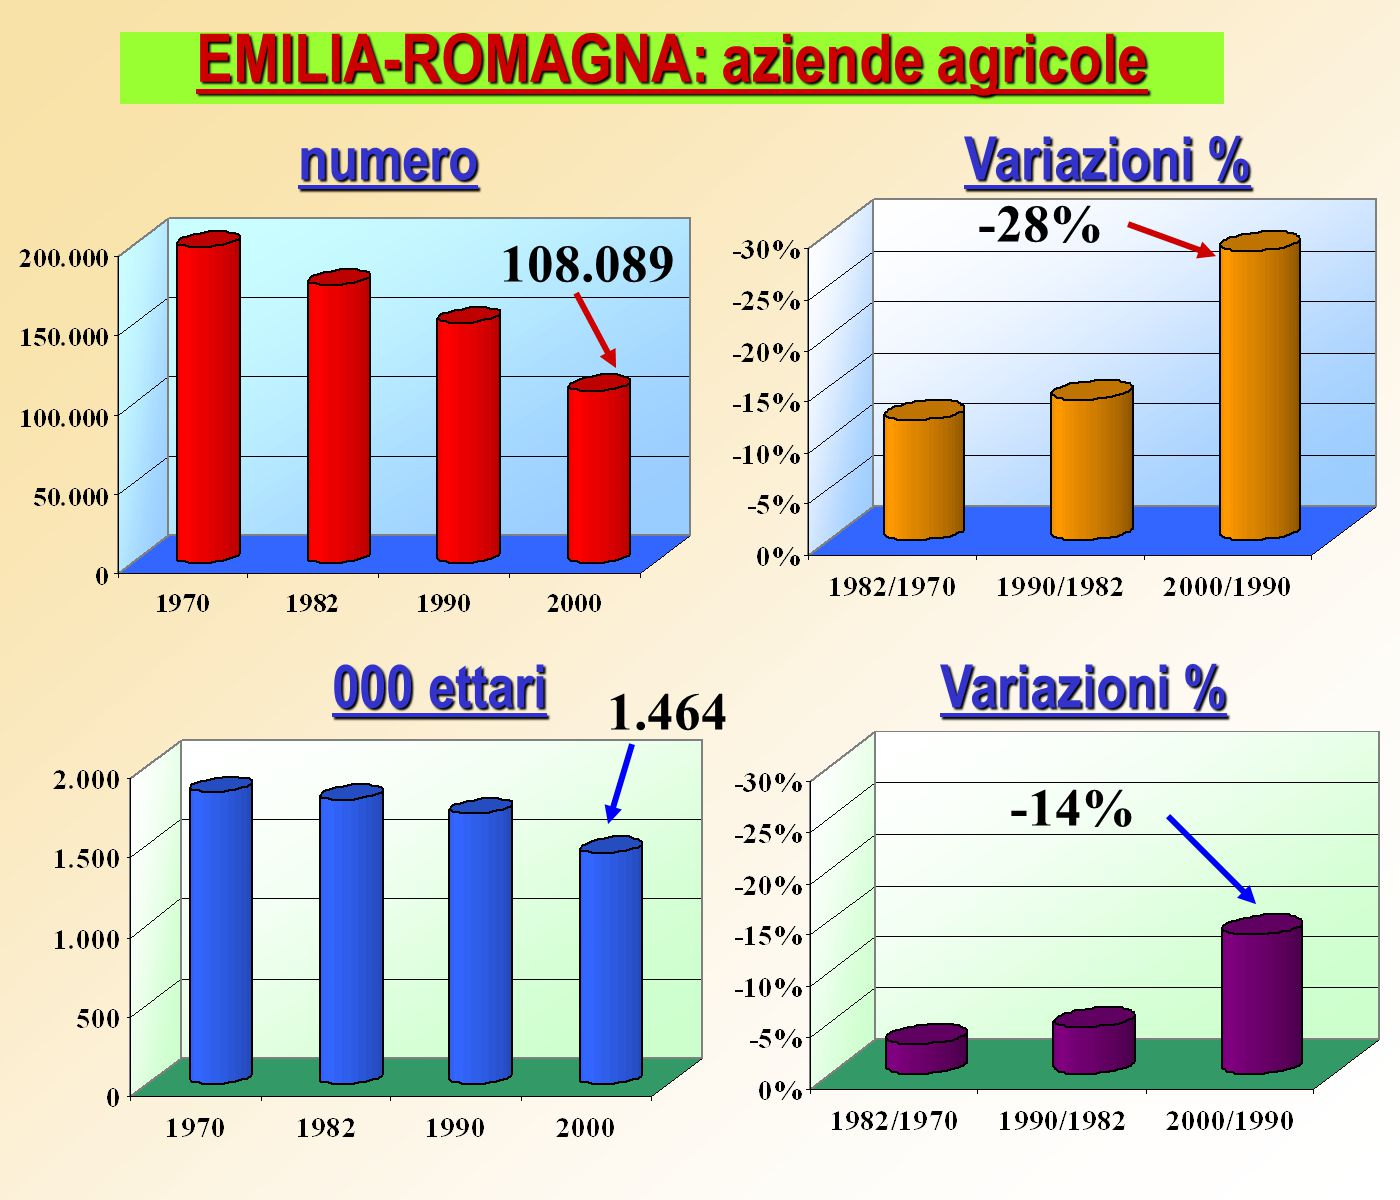 EMILIA-ROMAGNA: aziende con seminativi Variazioni % numero 000 ettari Variazioni % 79.573 -31% -7,5% 848.000